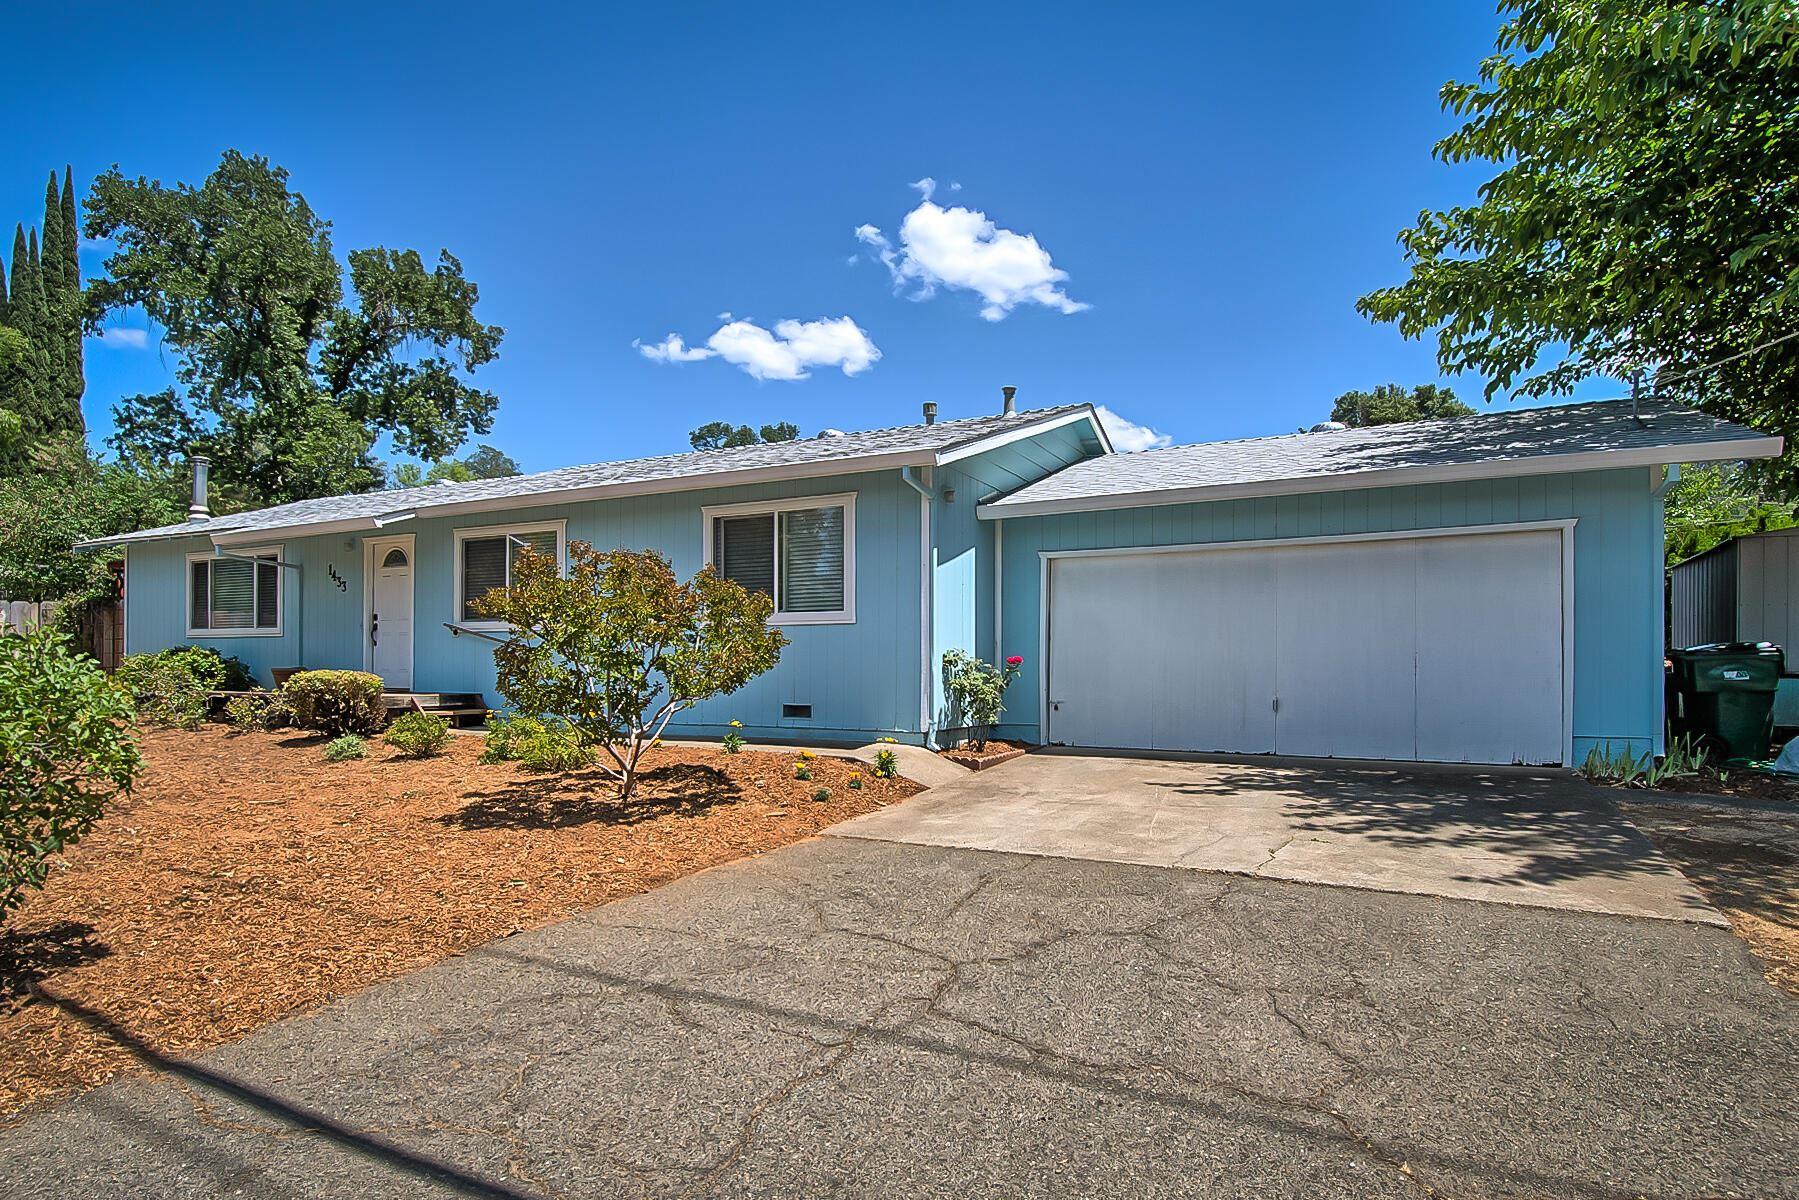 1433 Mussel Shoals Ave, Shasta Lake, CA 96019 - MLS#: 21-4441